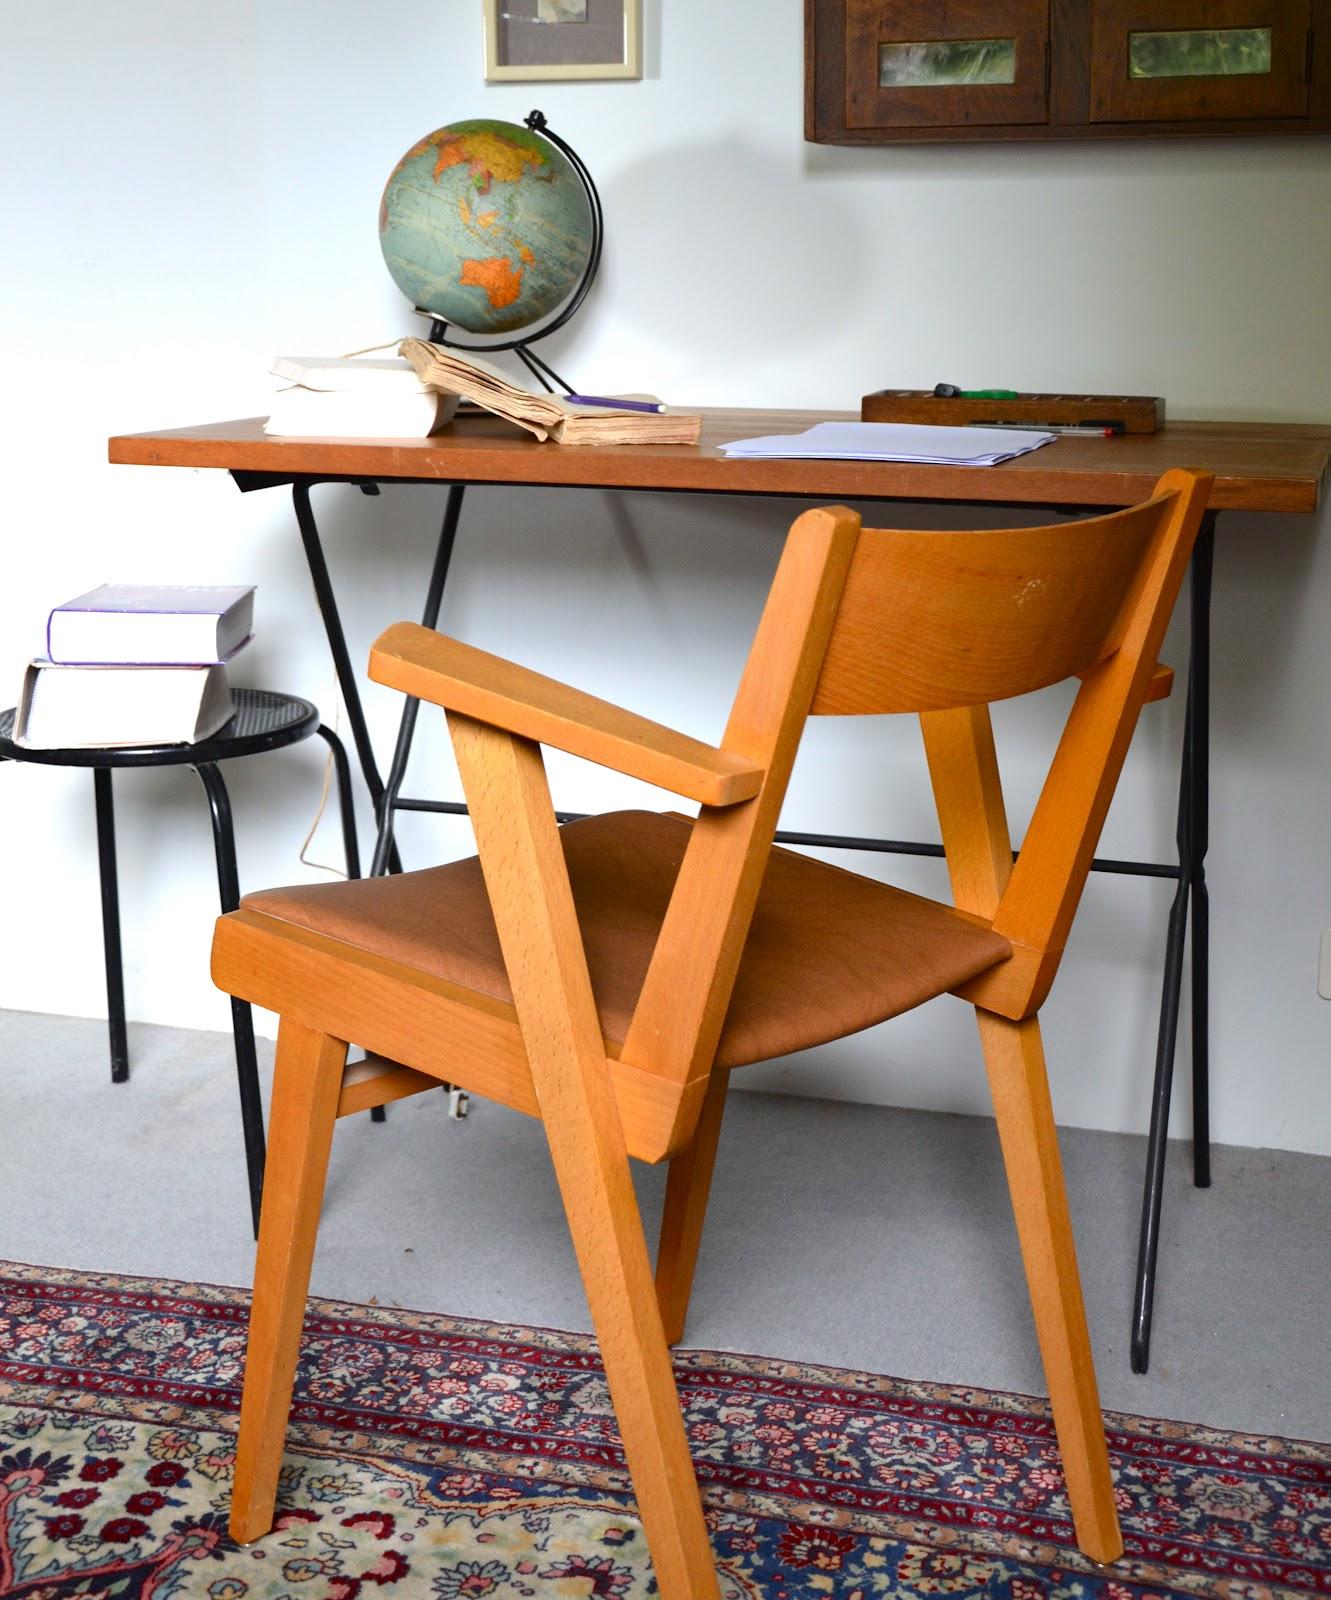 bindies octobre 2013. Black Bedroom Furniture Sets. Home Design Ideas